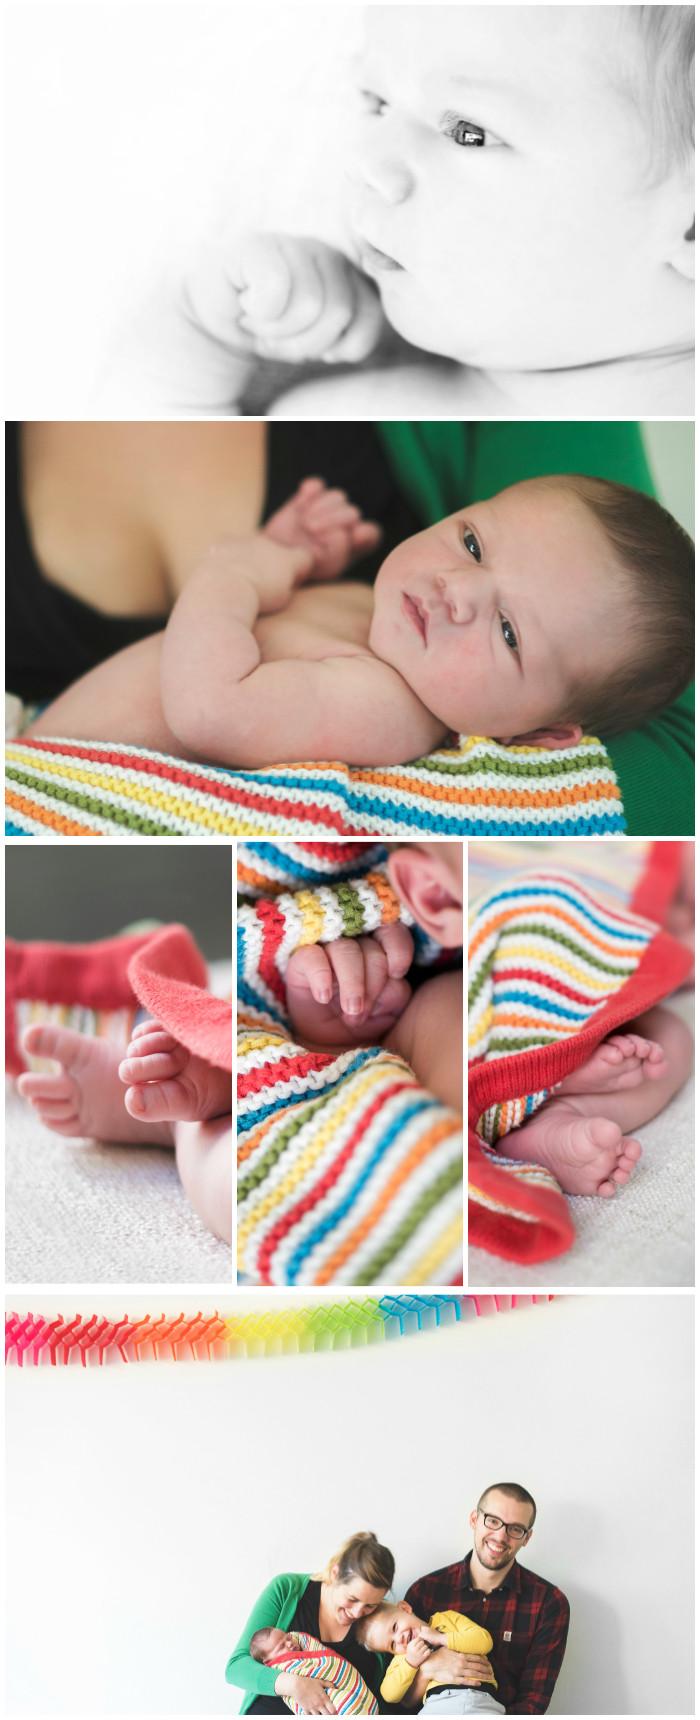 Newbornfotografie in Gent (c) Silvie Bonne